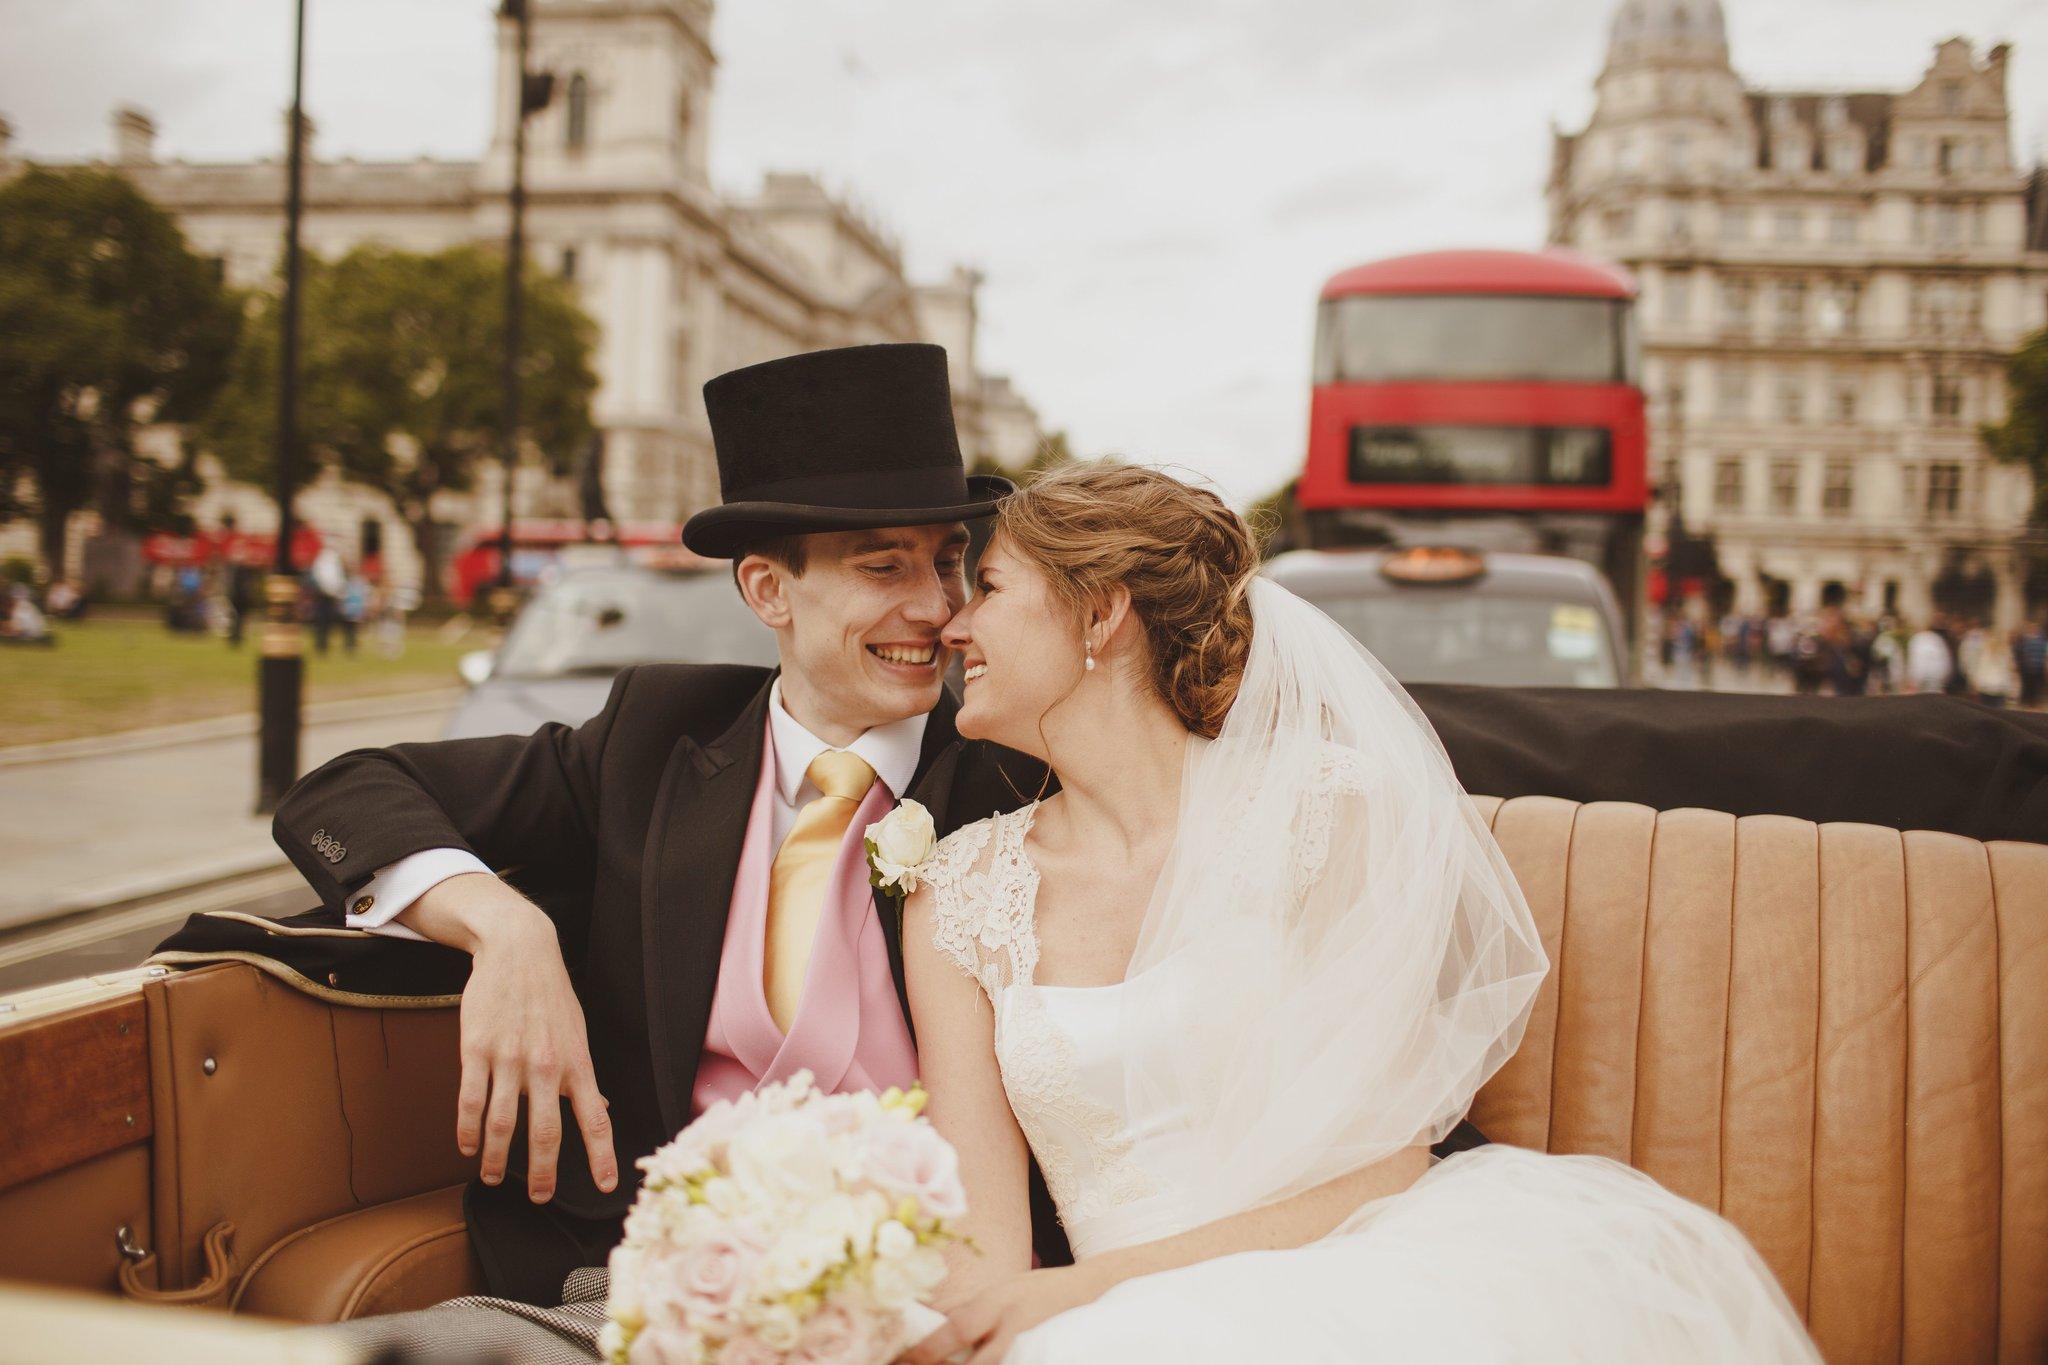 Wedding makeup artist Clapham South London, Essex, North London